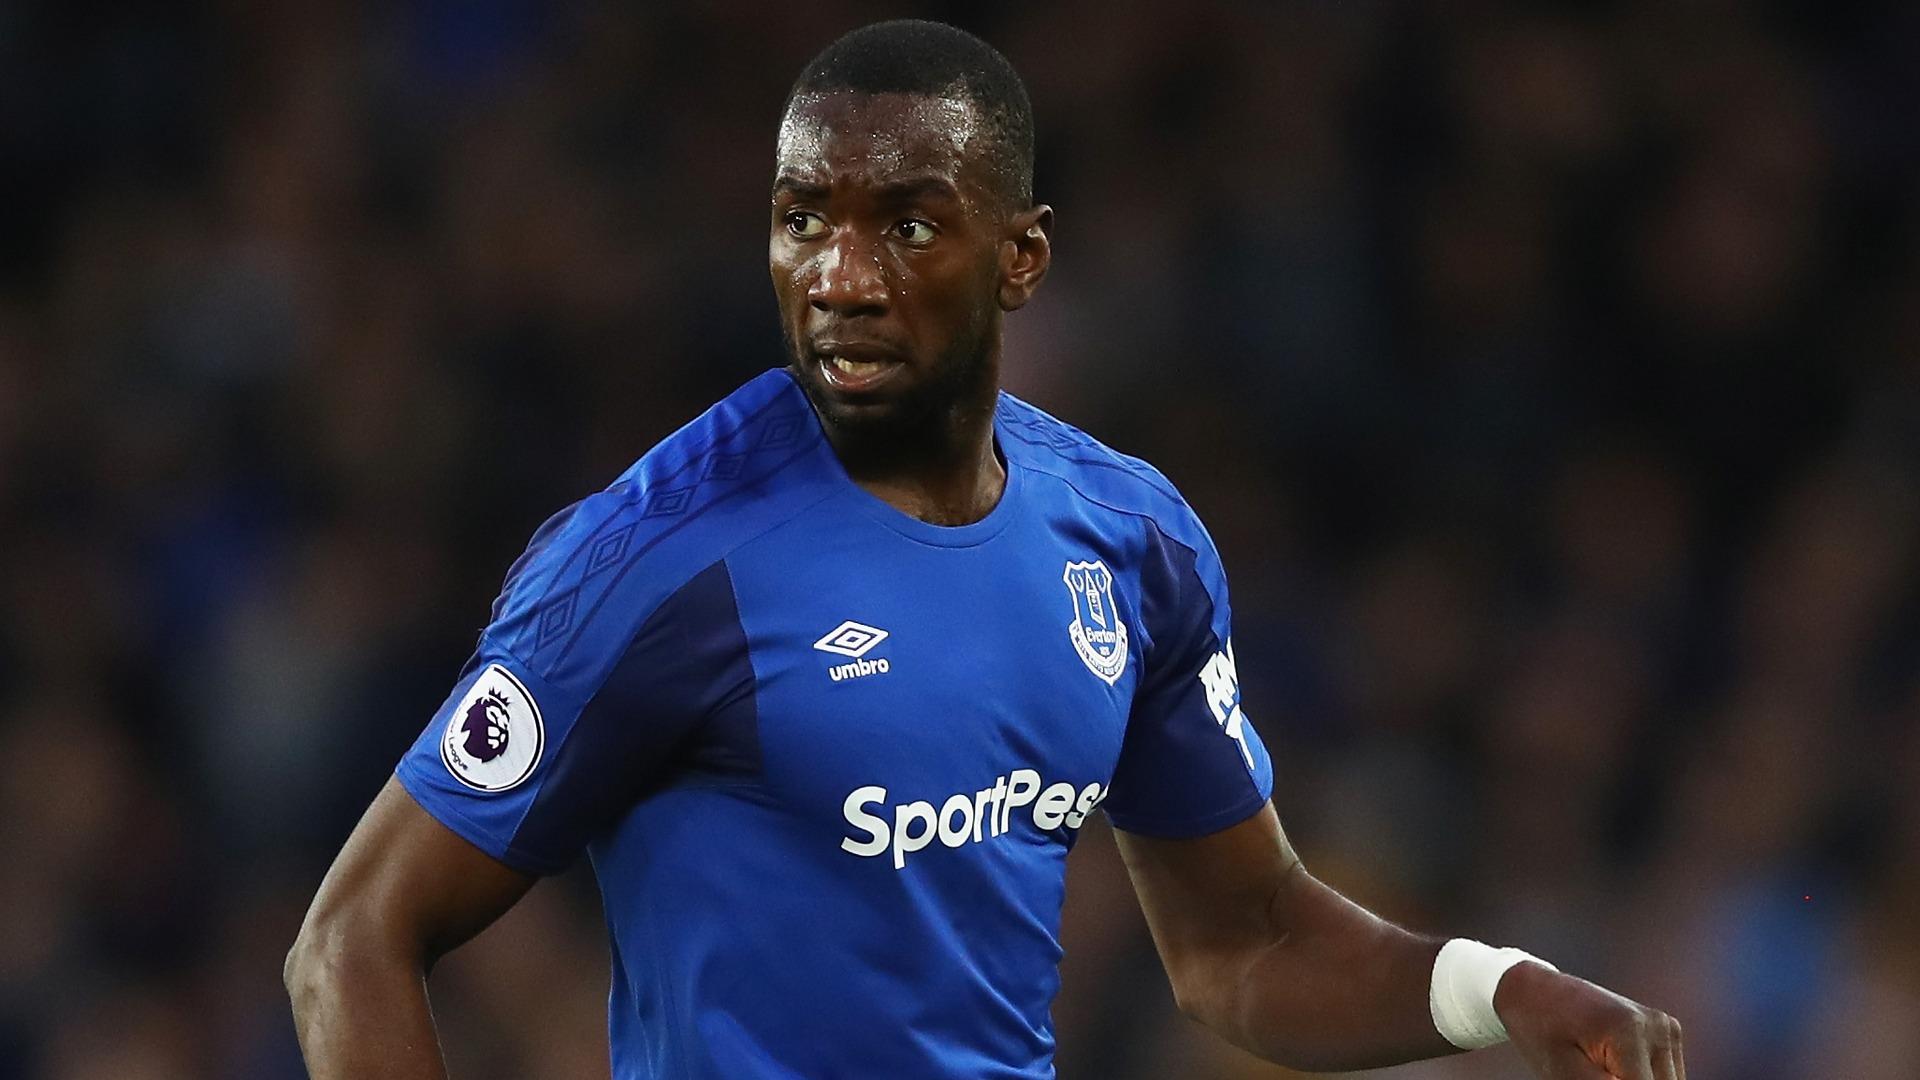 Everton confirm release of Bolasie and Adeniran